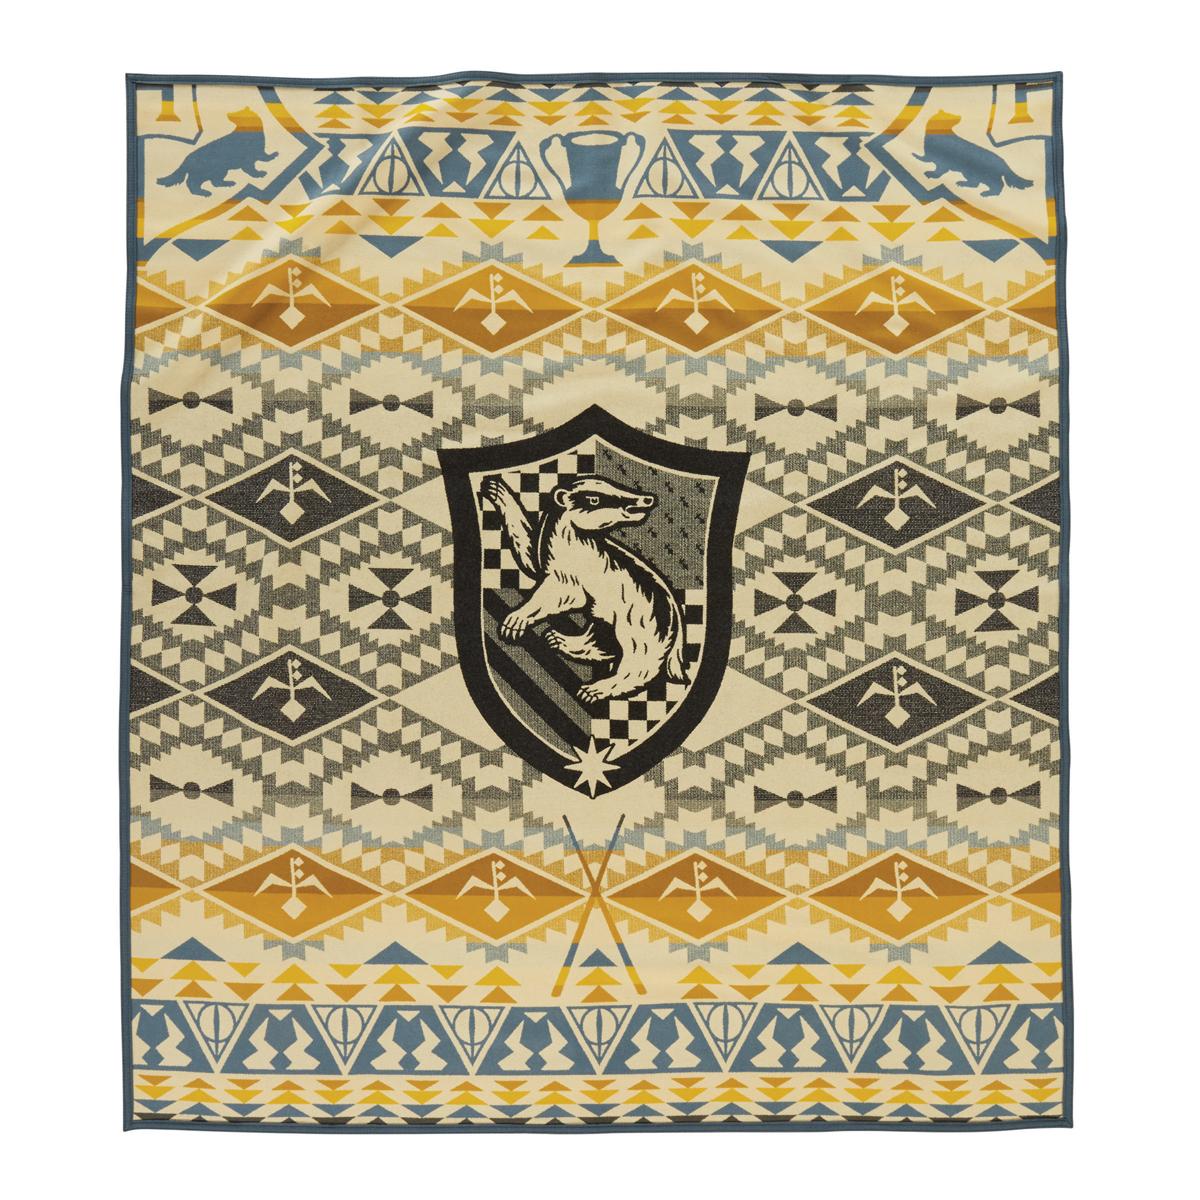 The Hufflepuff blanket by Pendleton